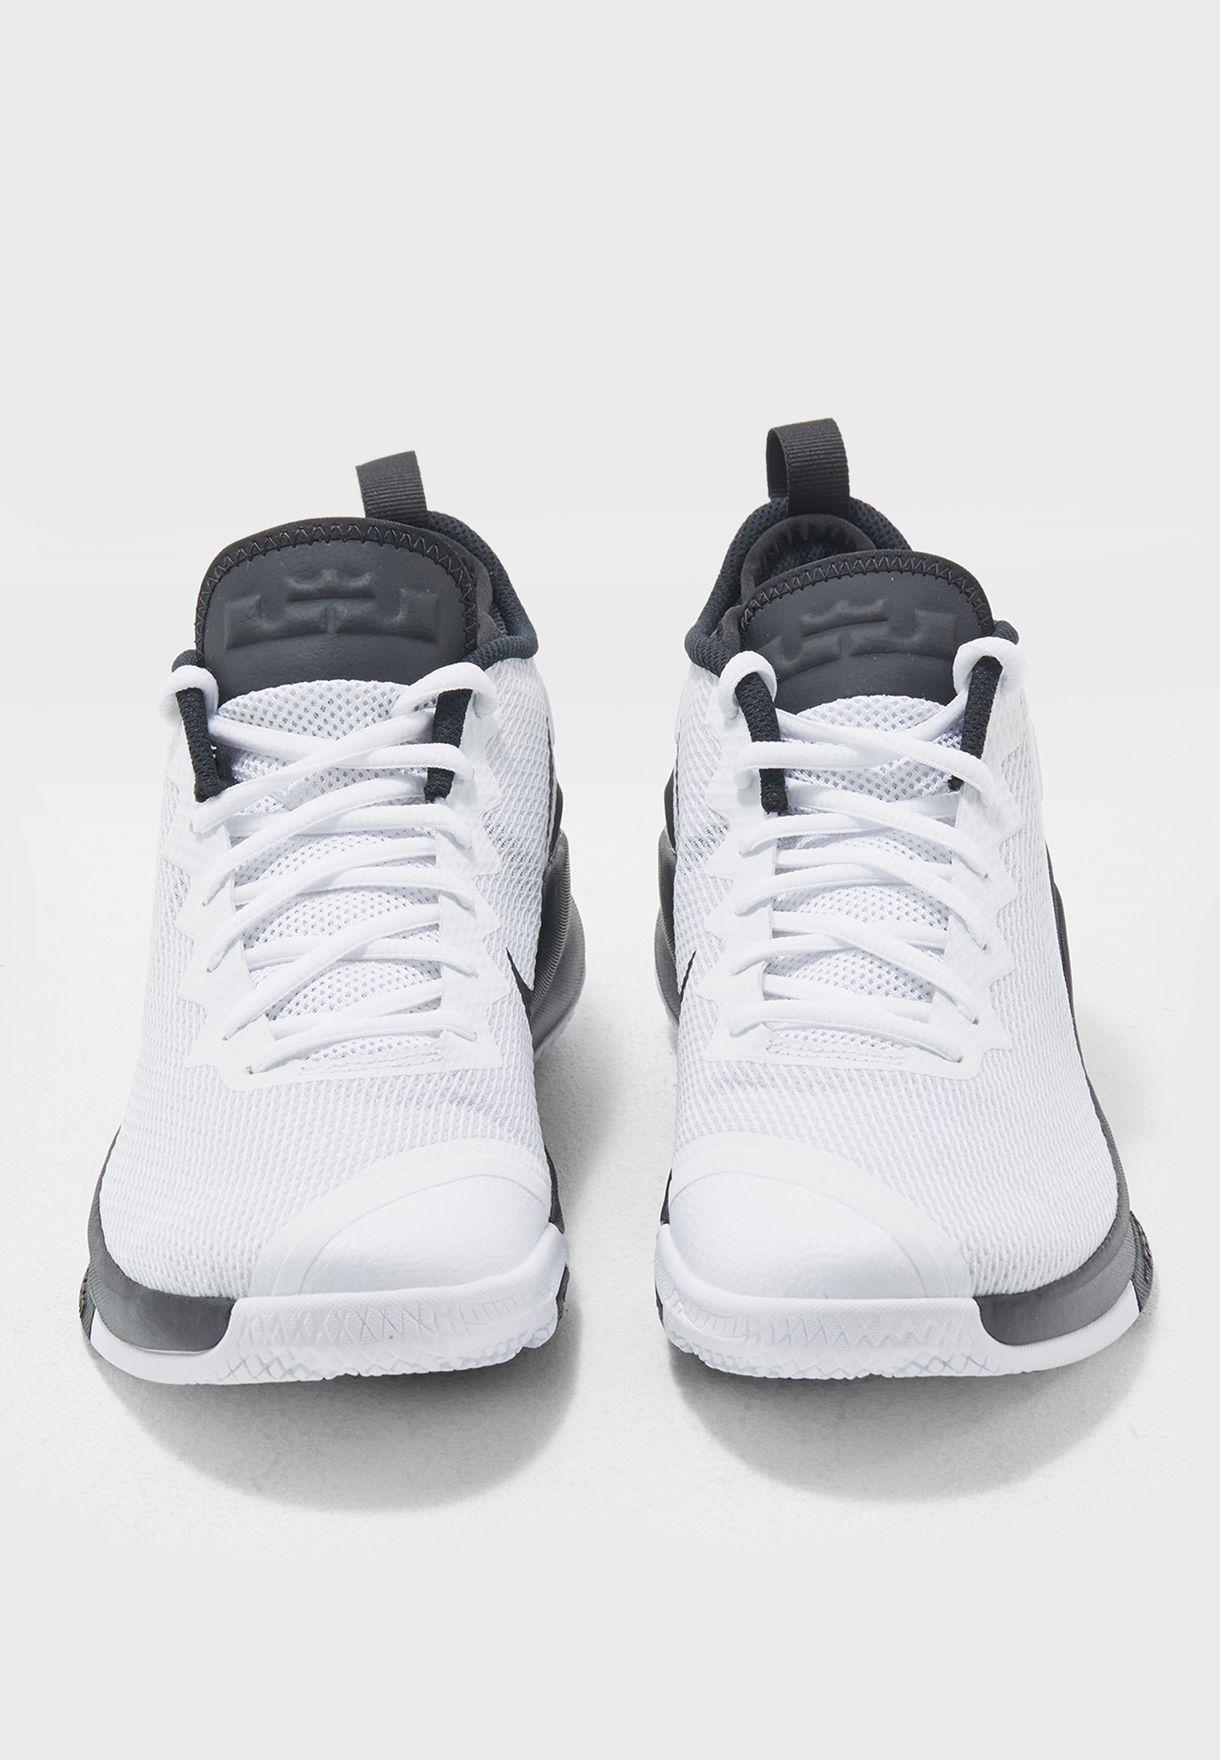 d7e0e876c7c3 Shop Nike white LeBron Witness II 942518-100 for Men in Saudi ...